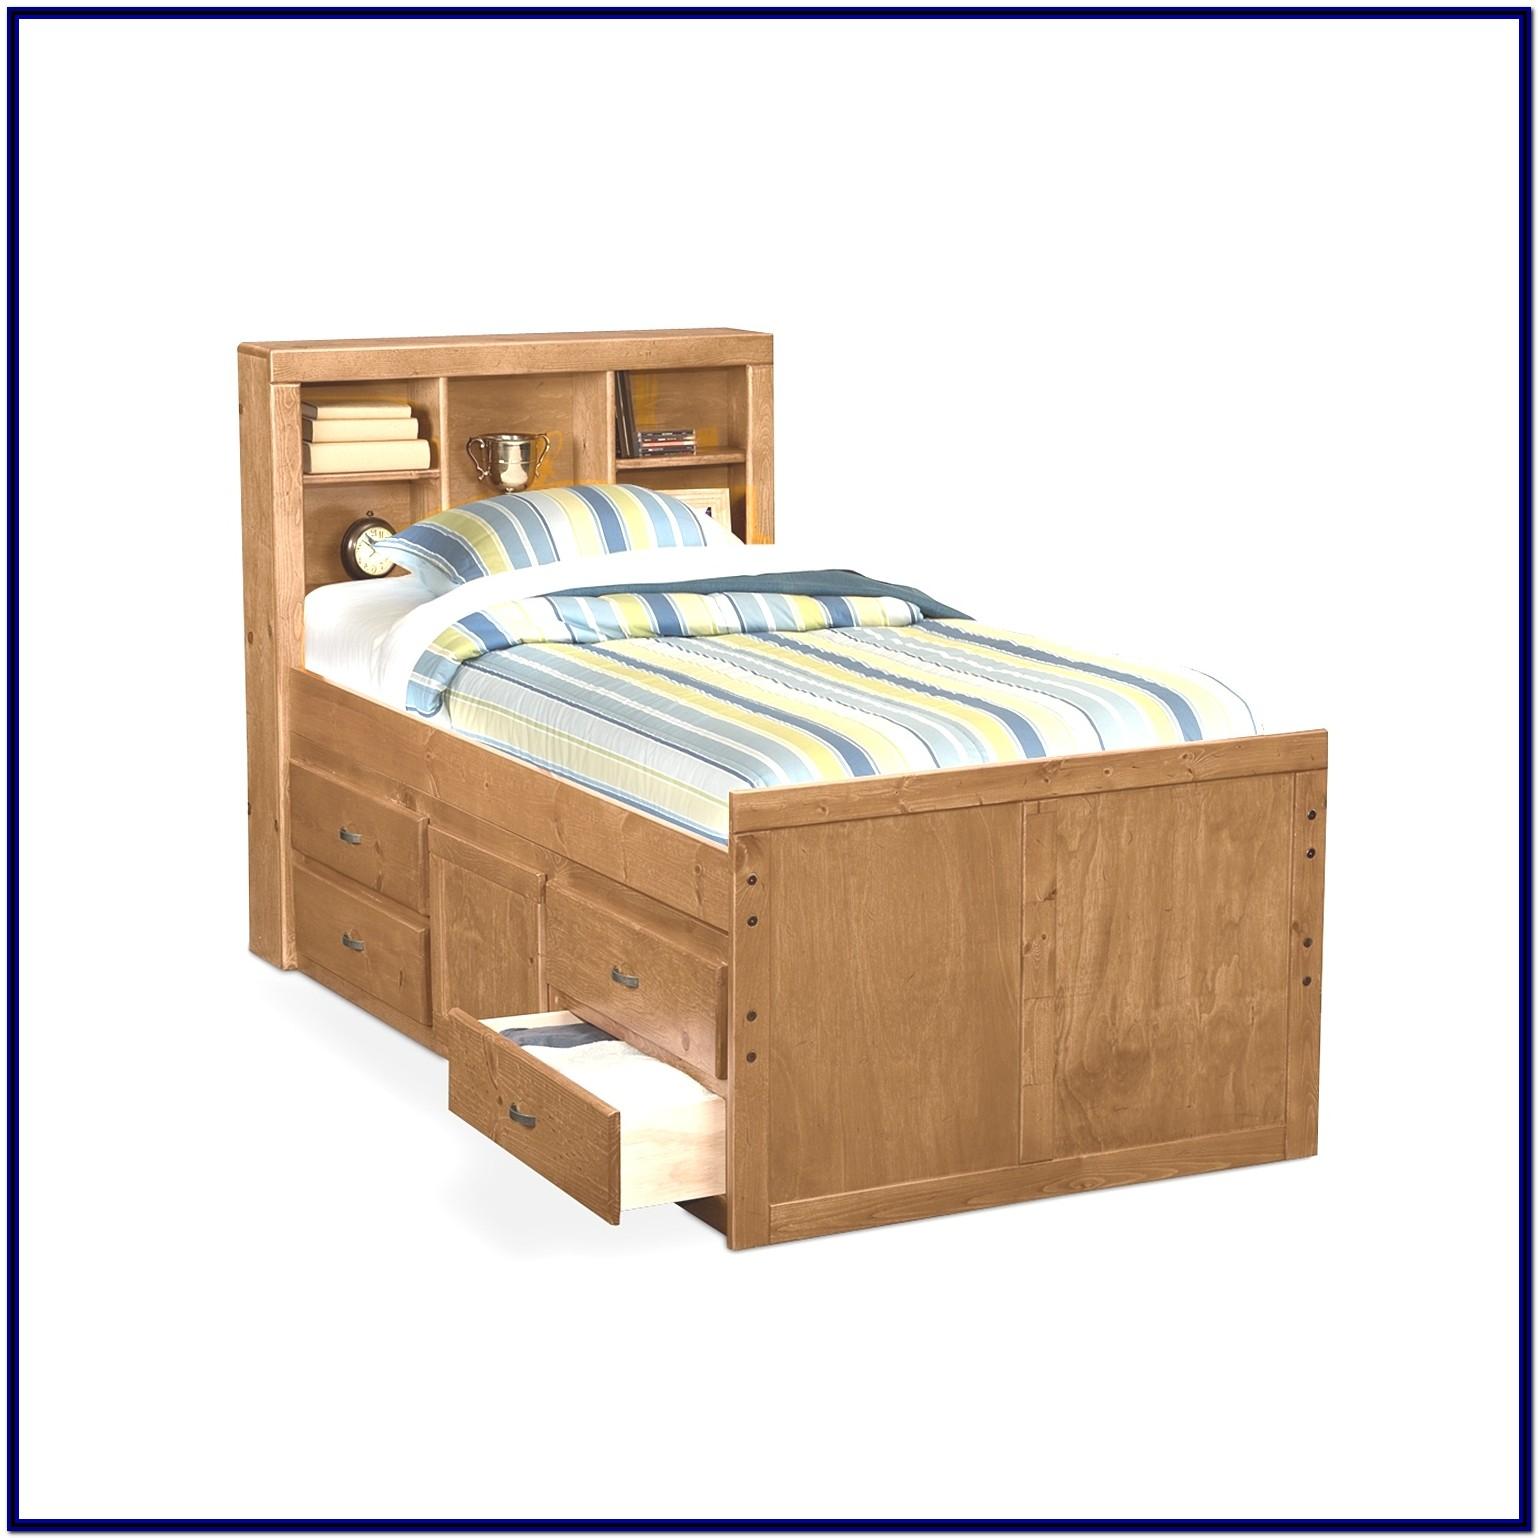 King Bed Frame With Storage Diy